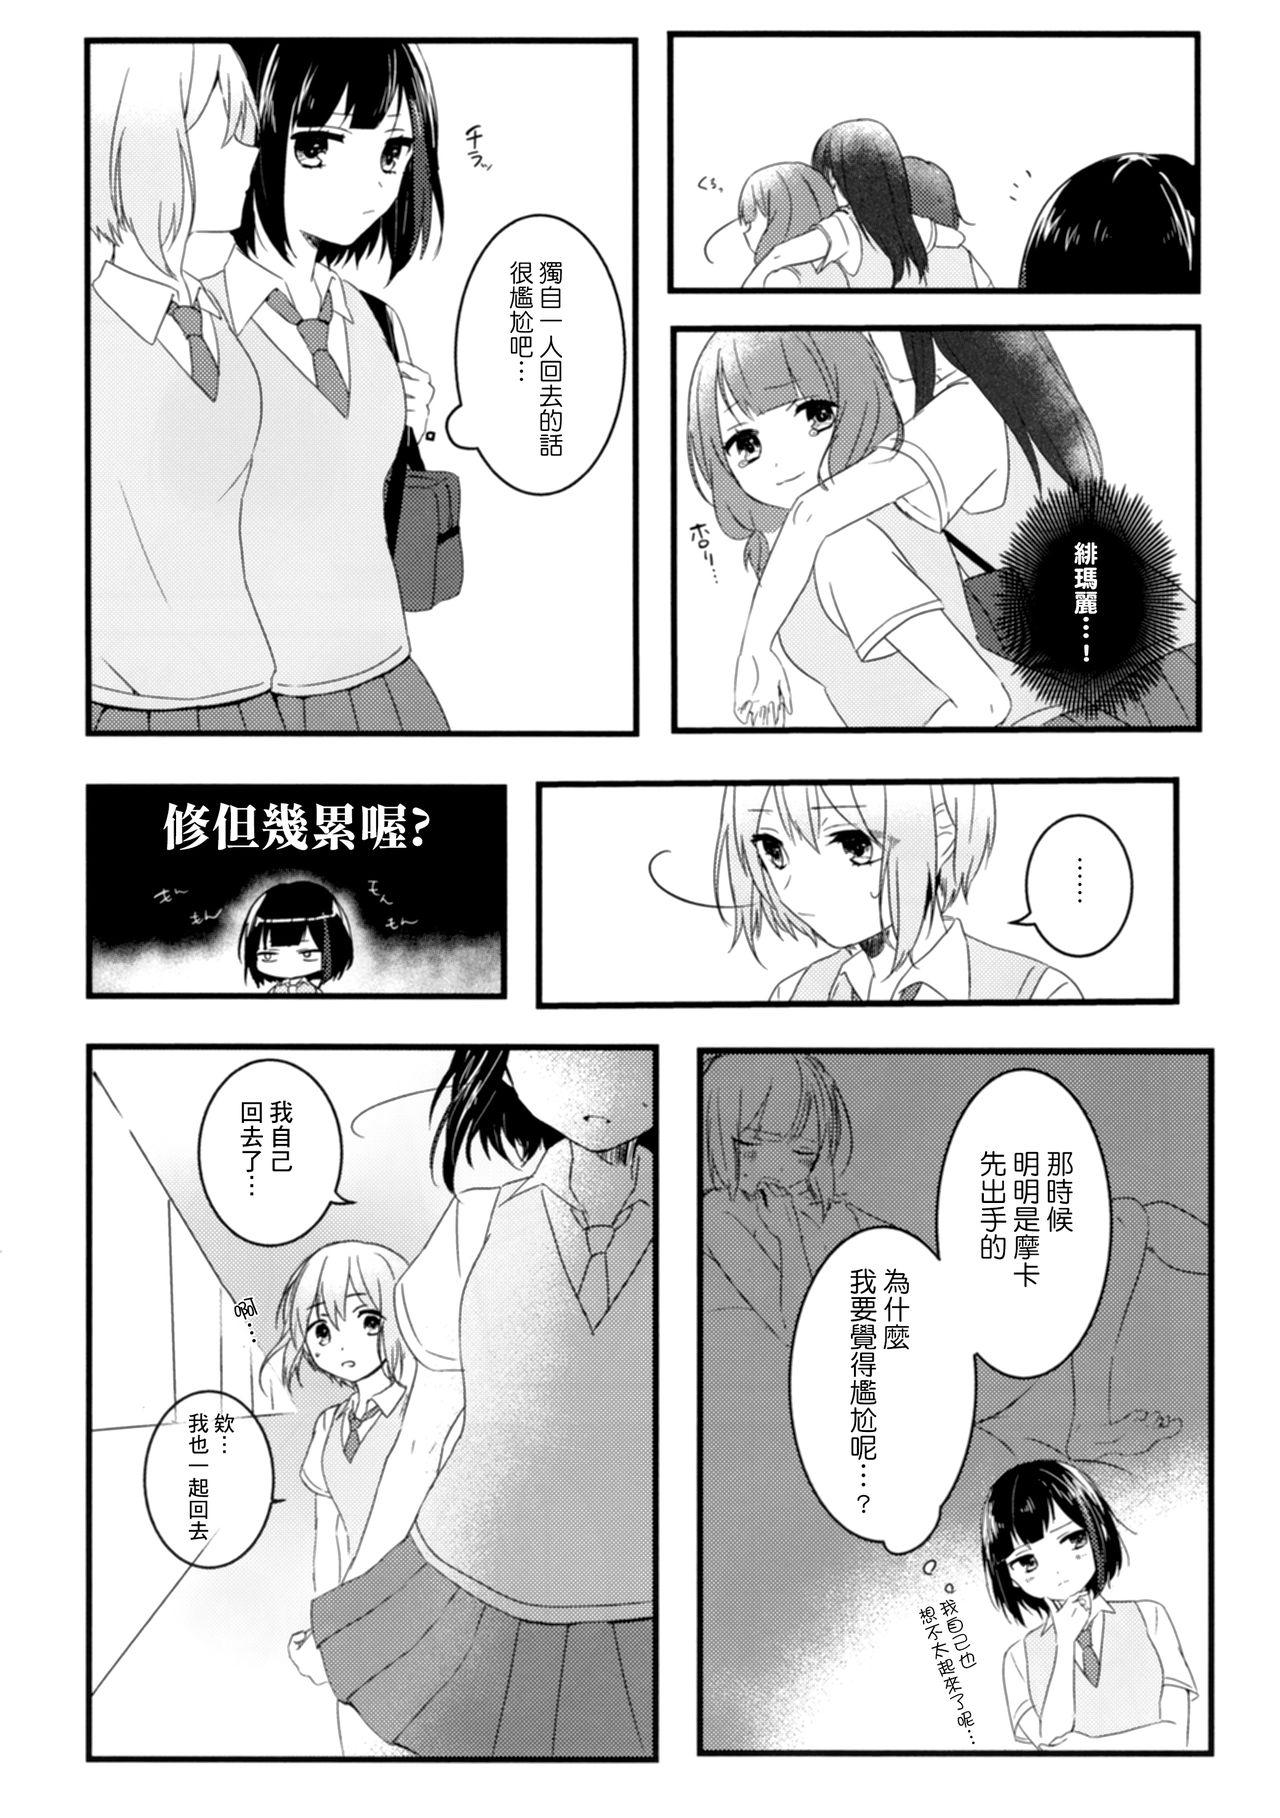 Secret relationship 10